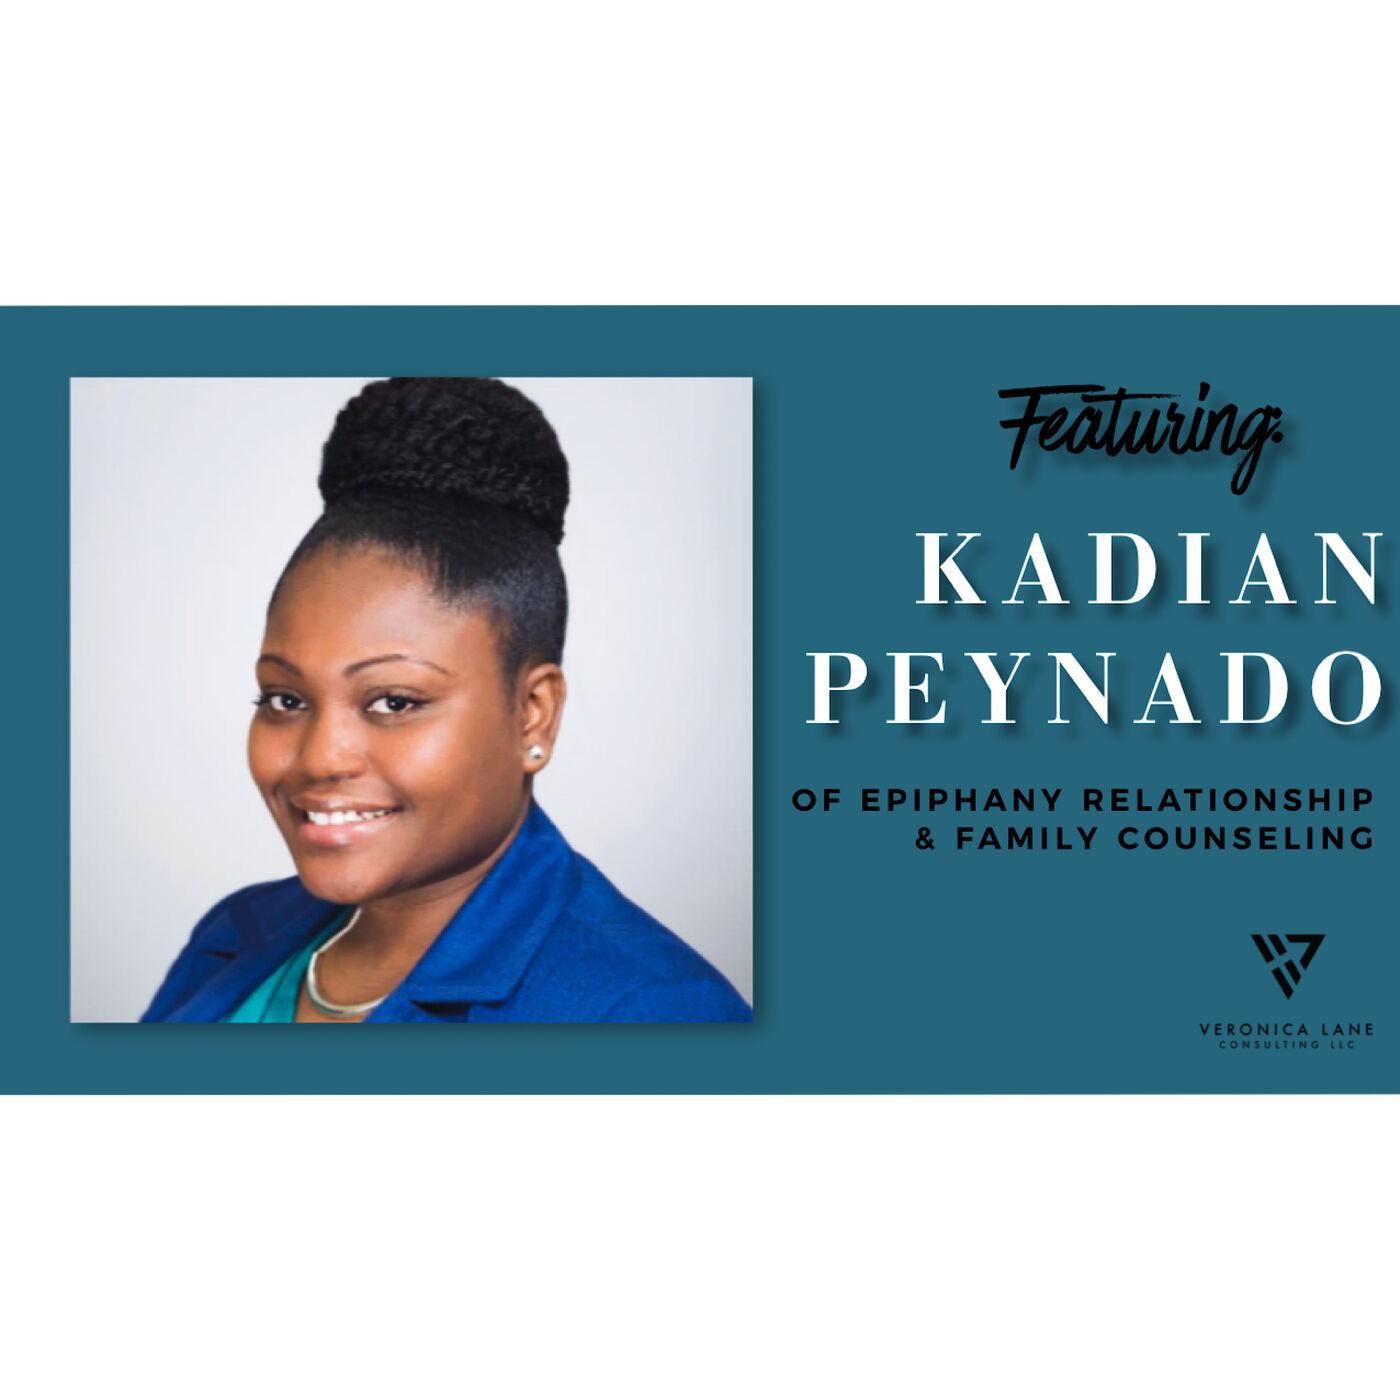 Mental Health & Project Management - Featuring Kadian Peynado, LPC, ACS, BC-TMH